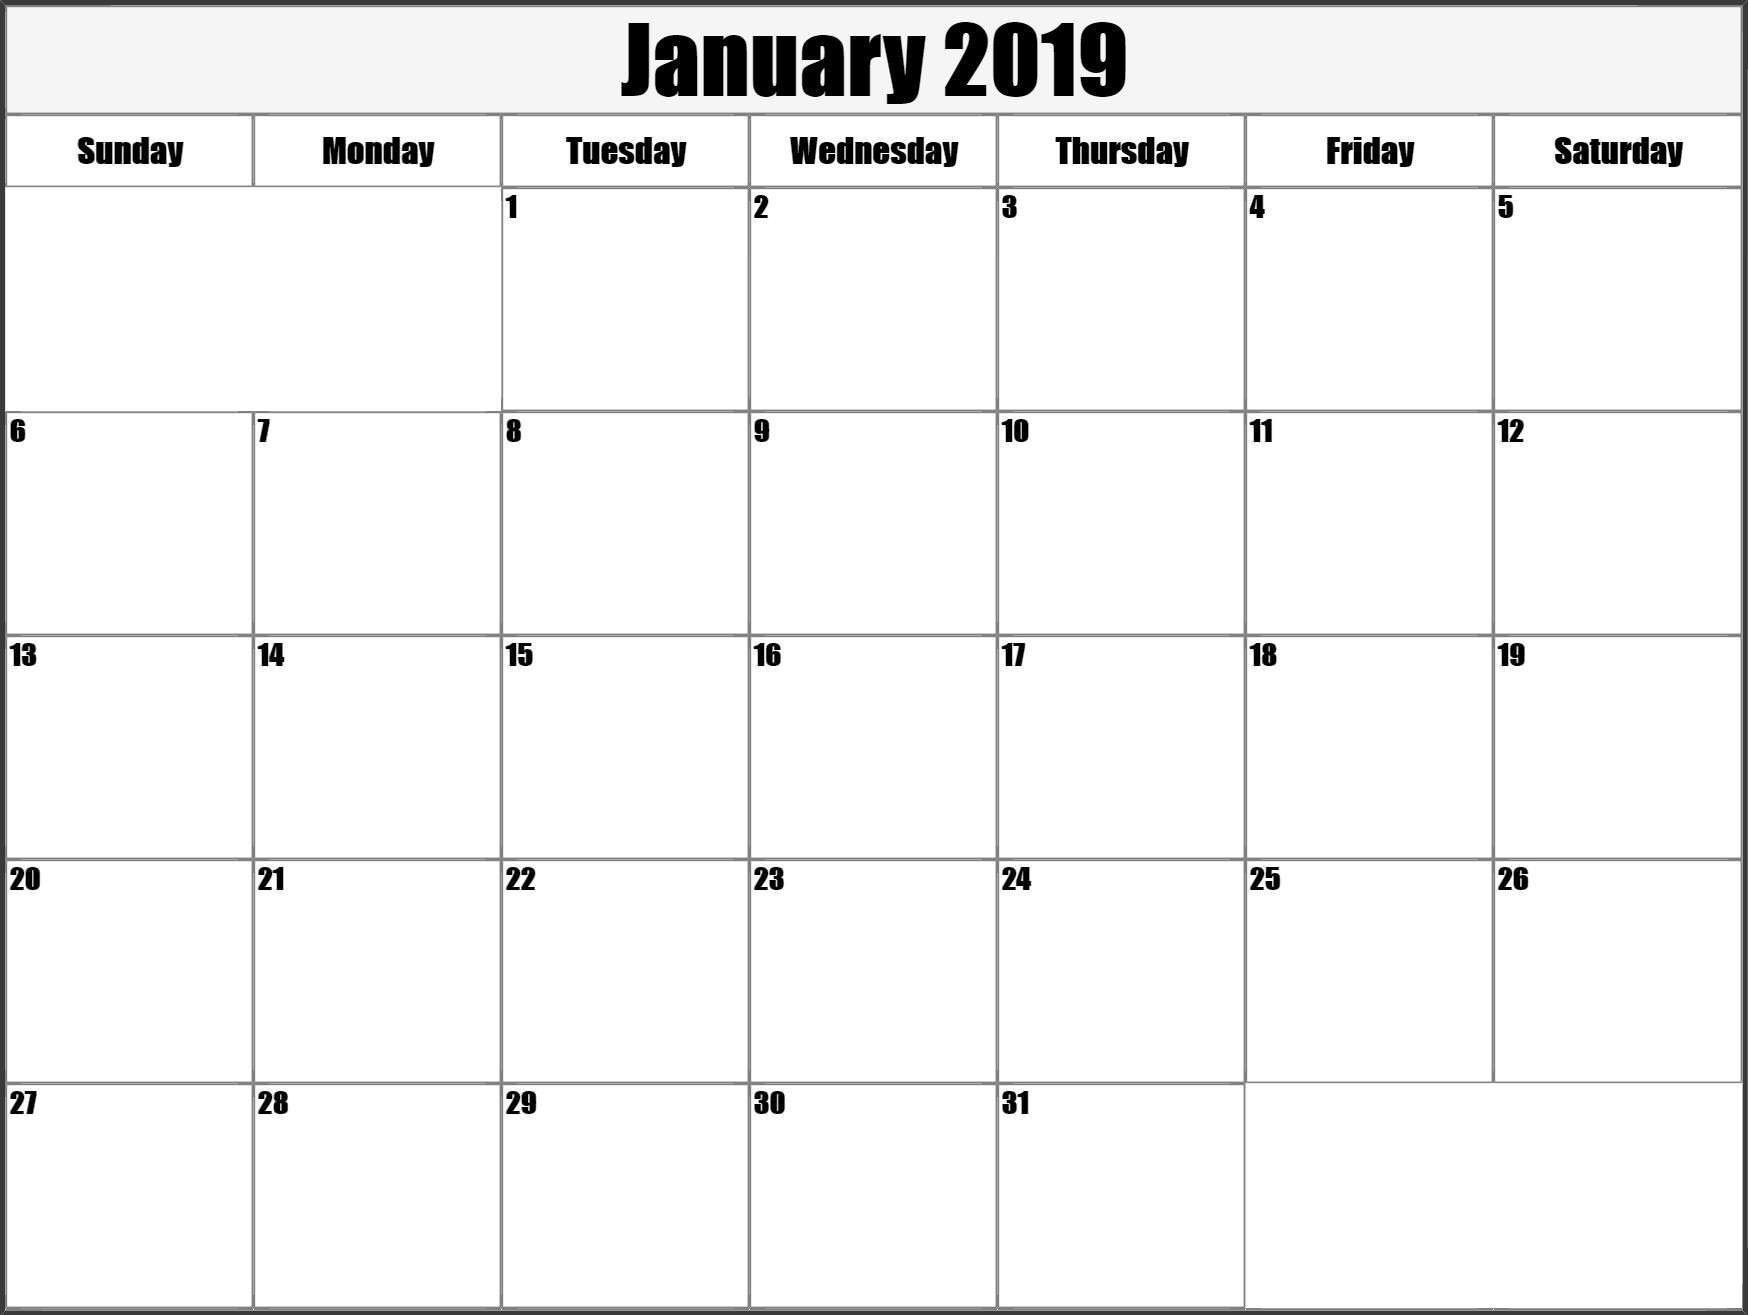 Calendar January 2019 Printable Large Calendar January 2019